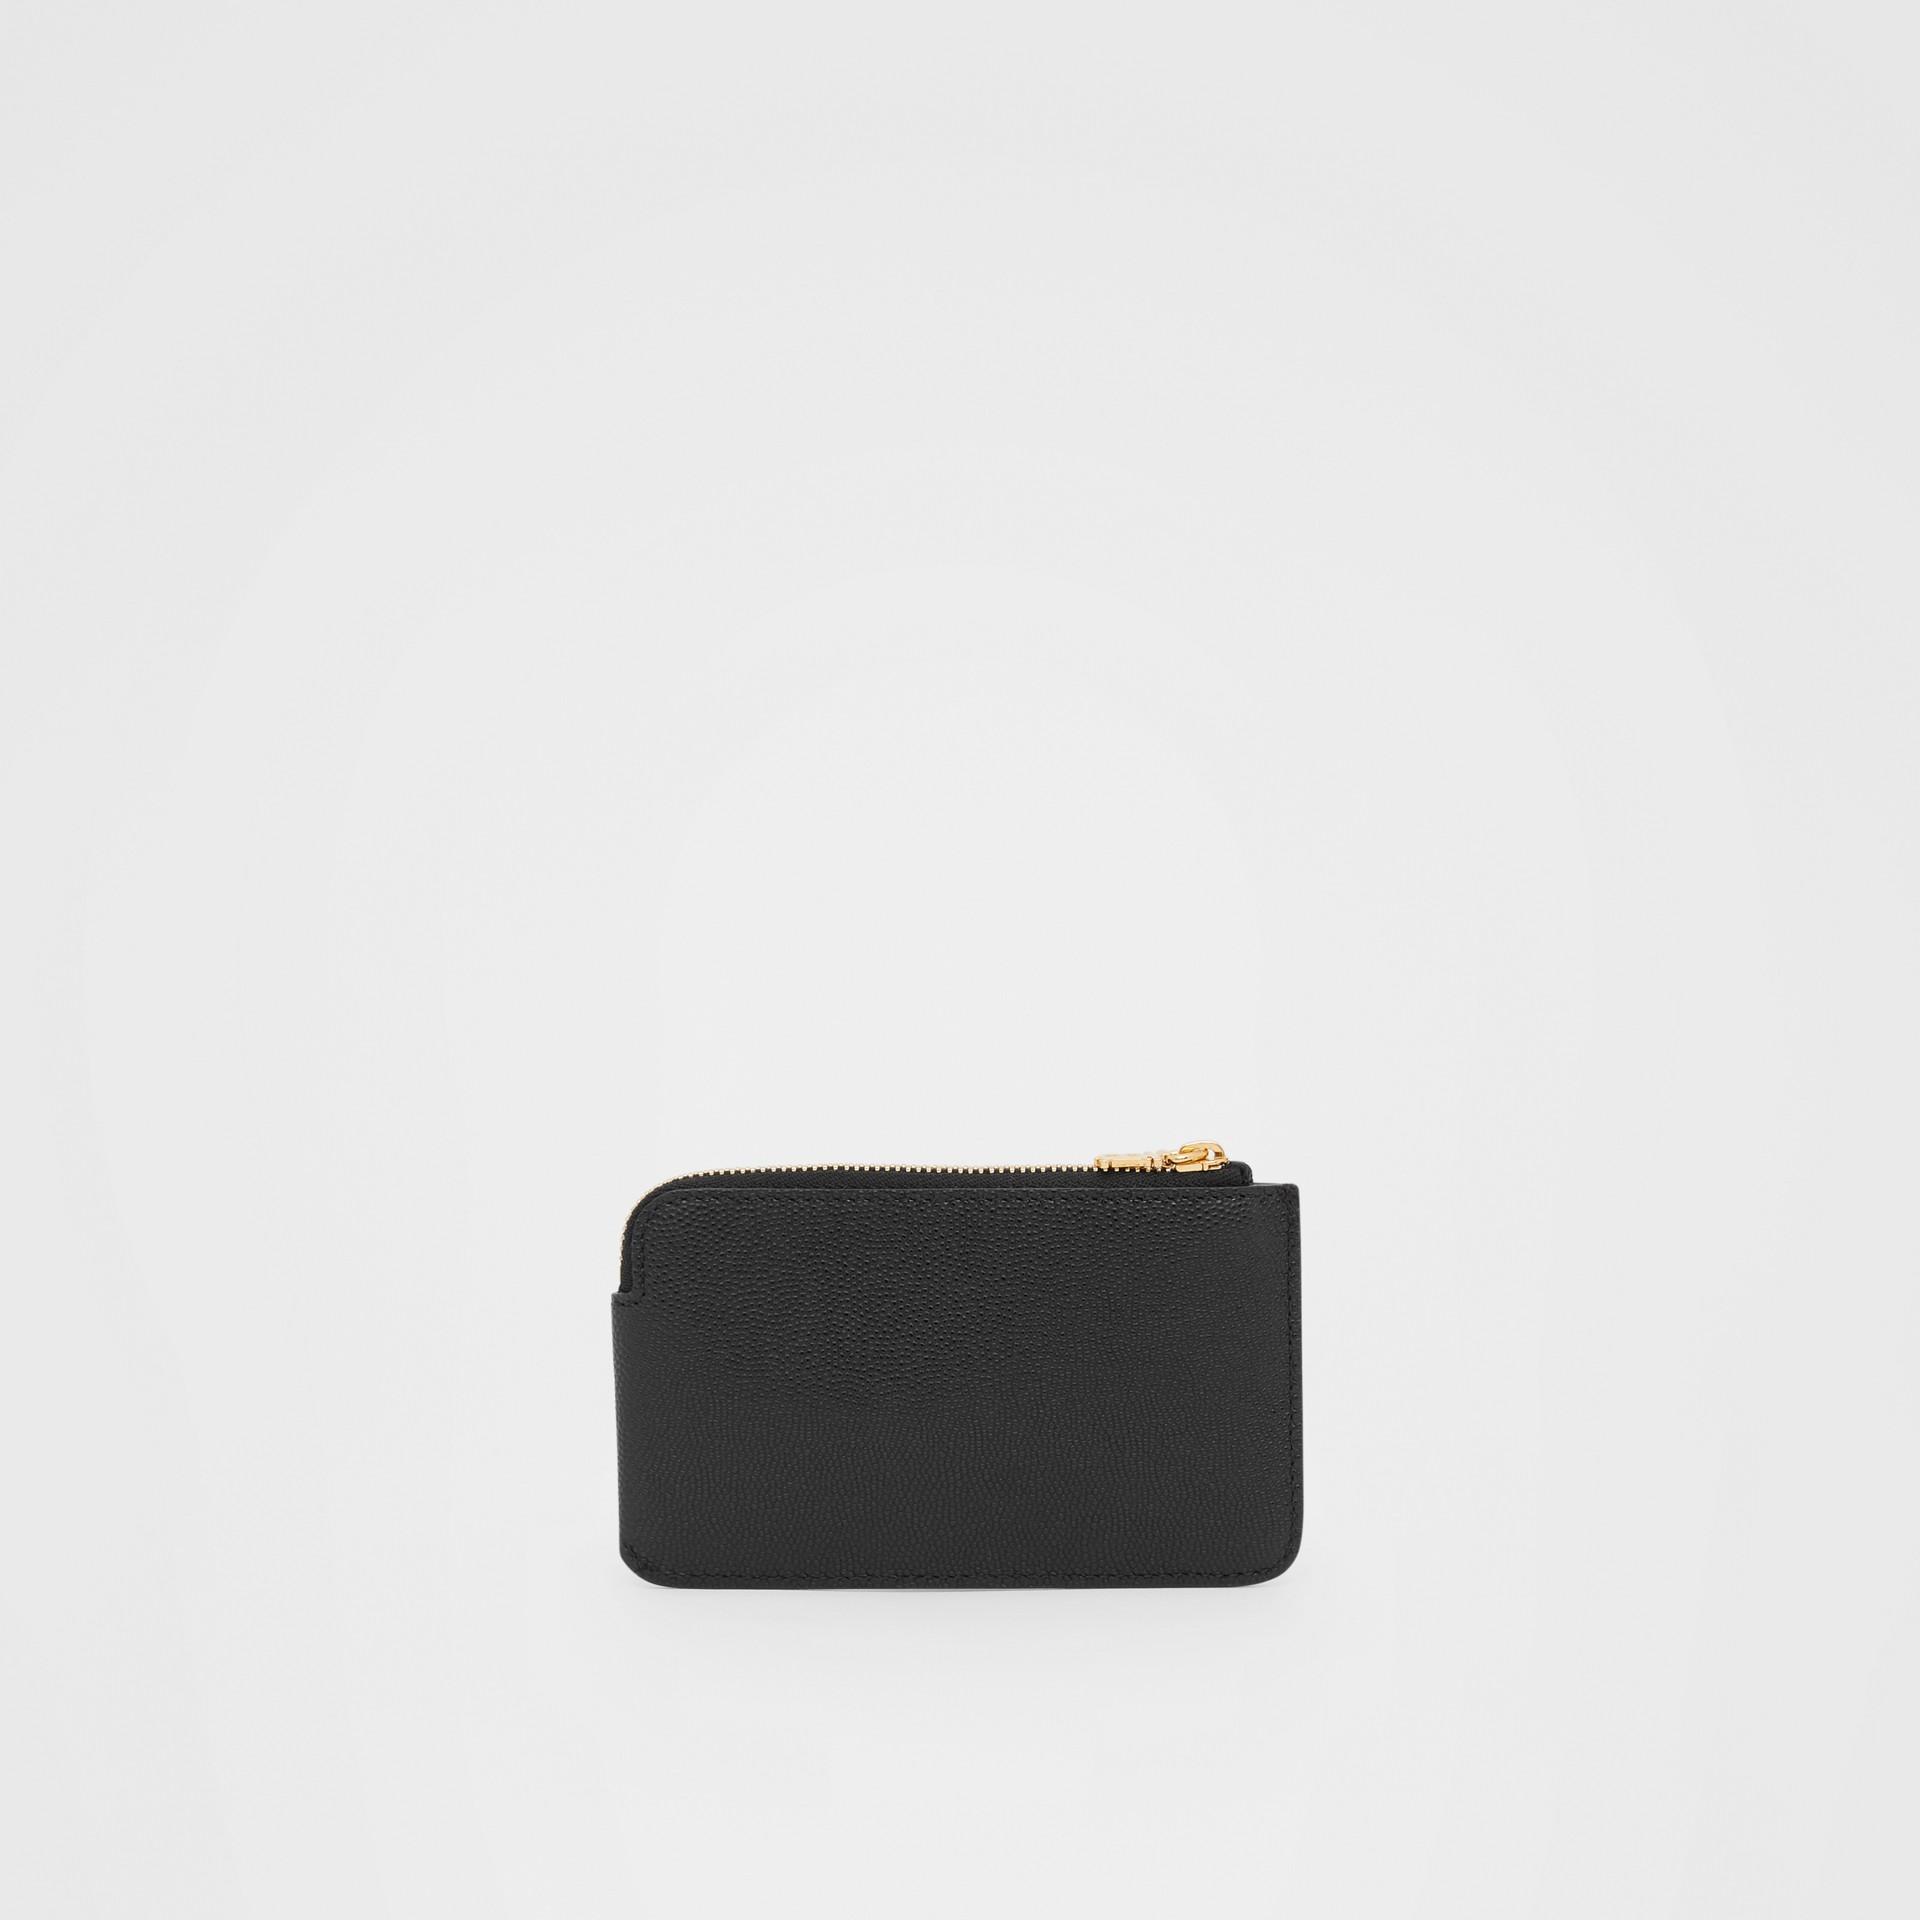 Monogram Motif Grainy Leather Zip Coin Case in Black - Women | Burberry - gallery image 4